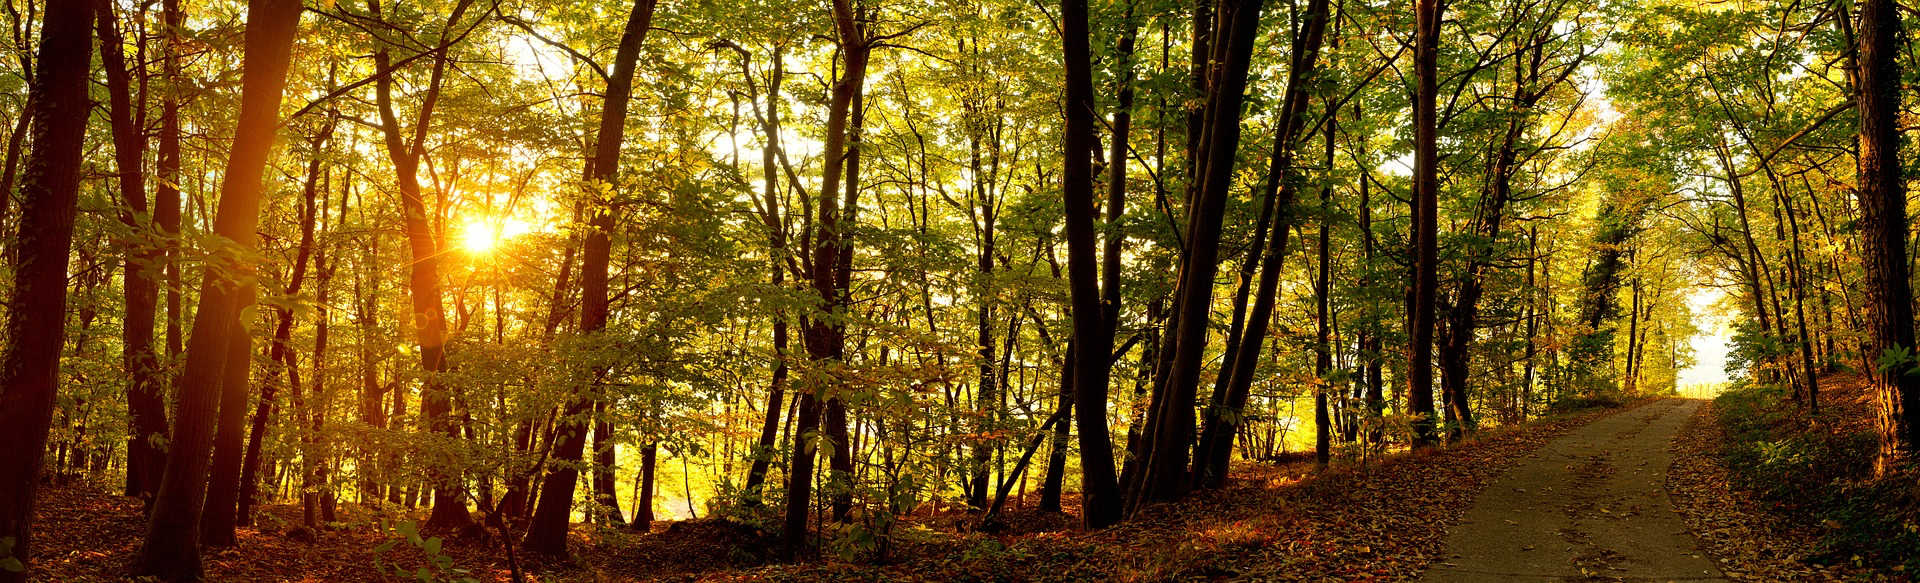 Brainspotclearing Wald Sonne Weg Abend www.phaidros.org